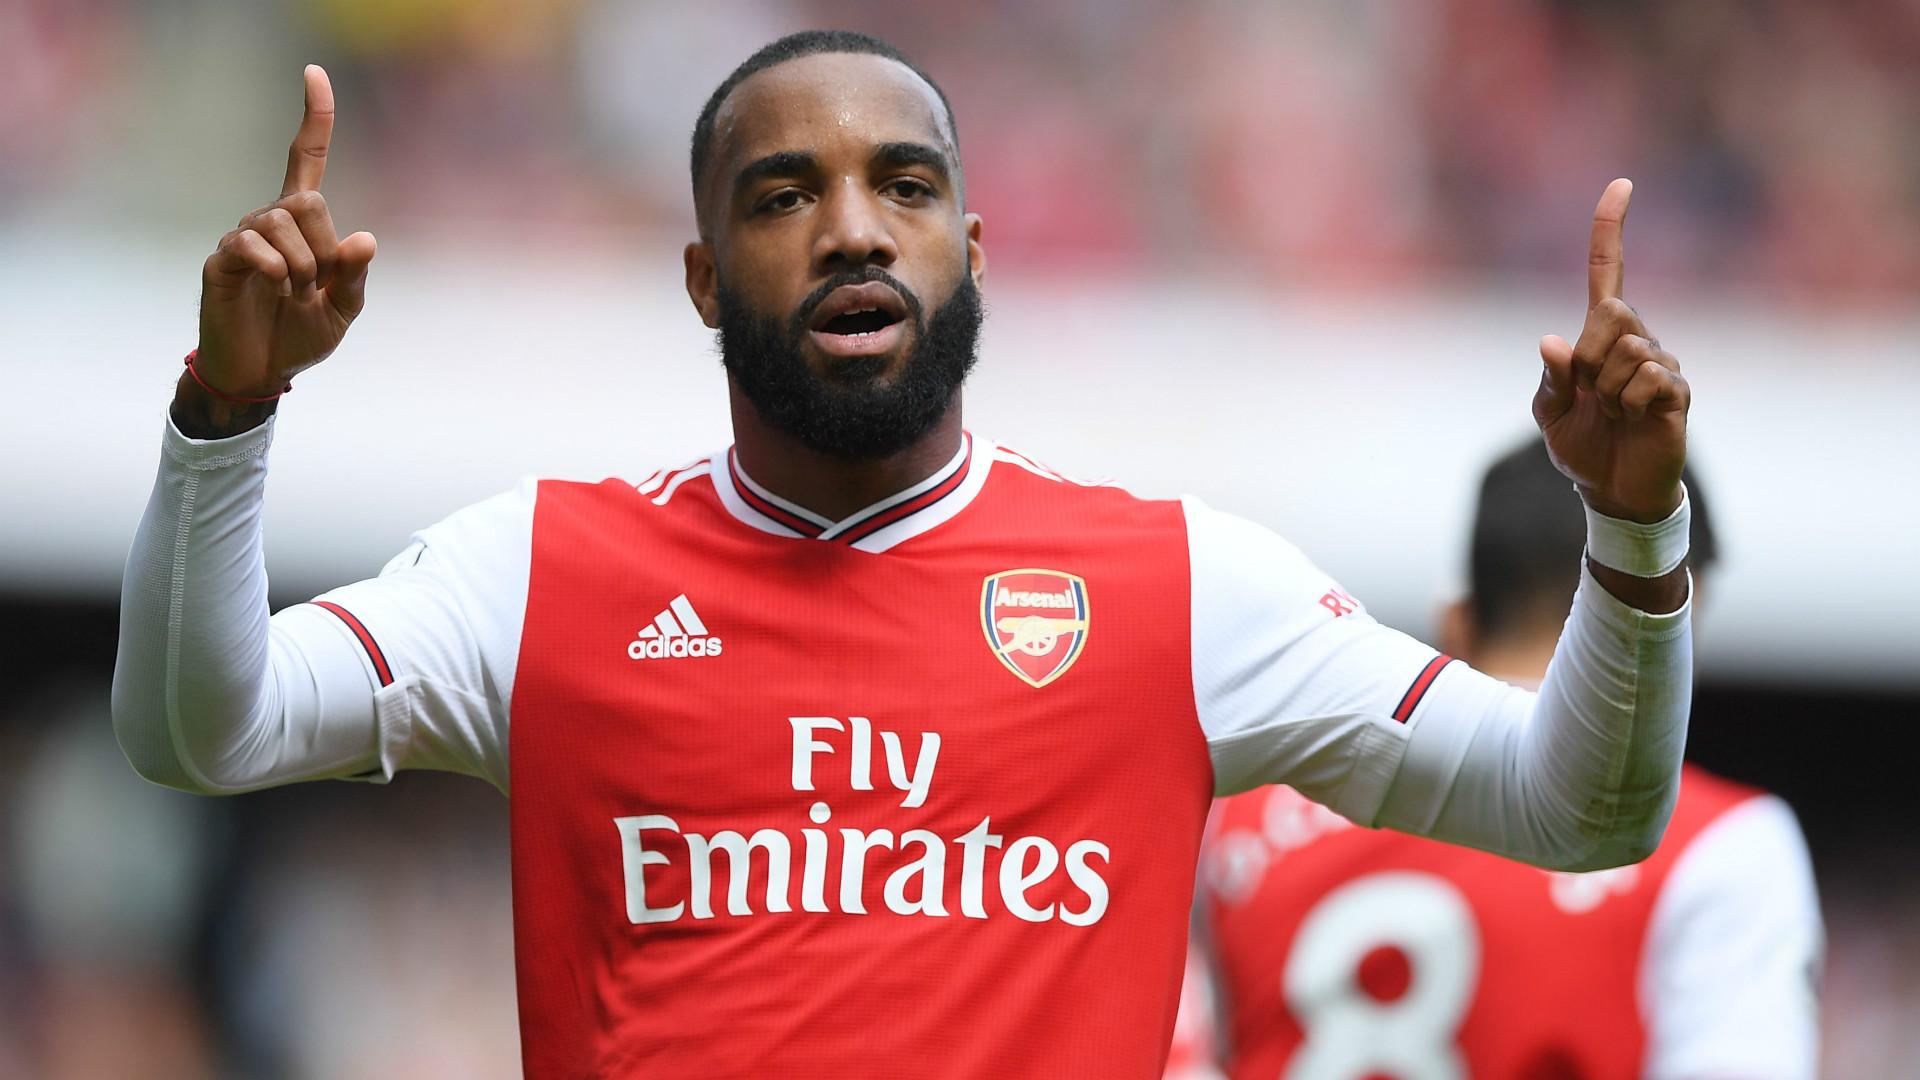 Lacazette insists Arsenal squad definitely still support Emery   Goal.com